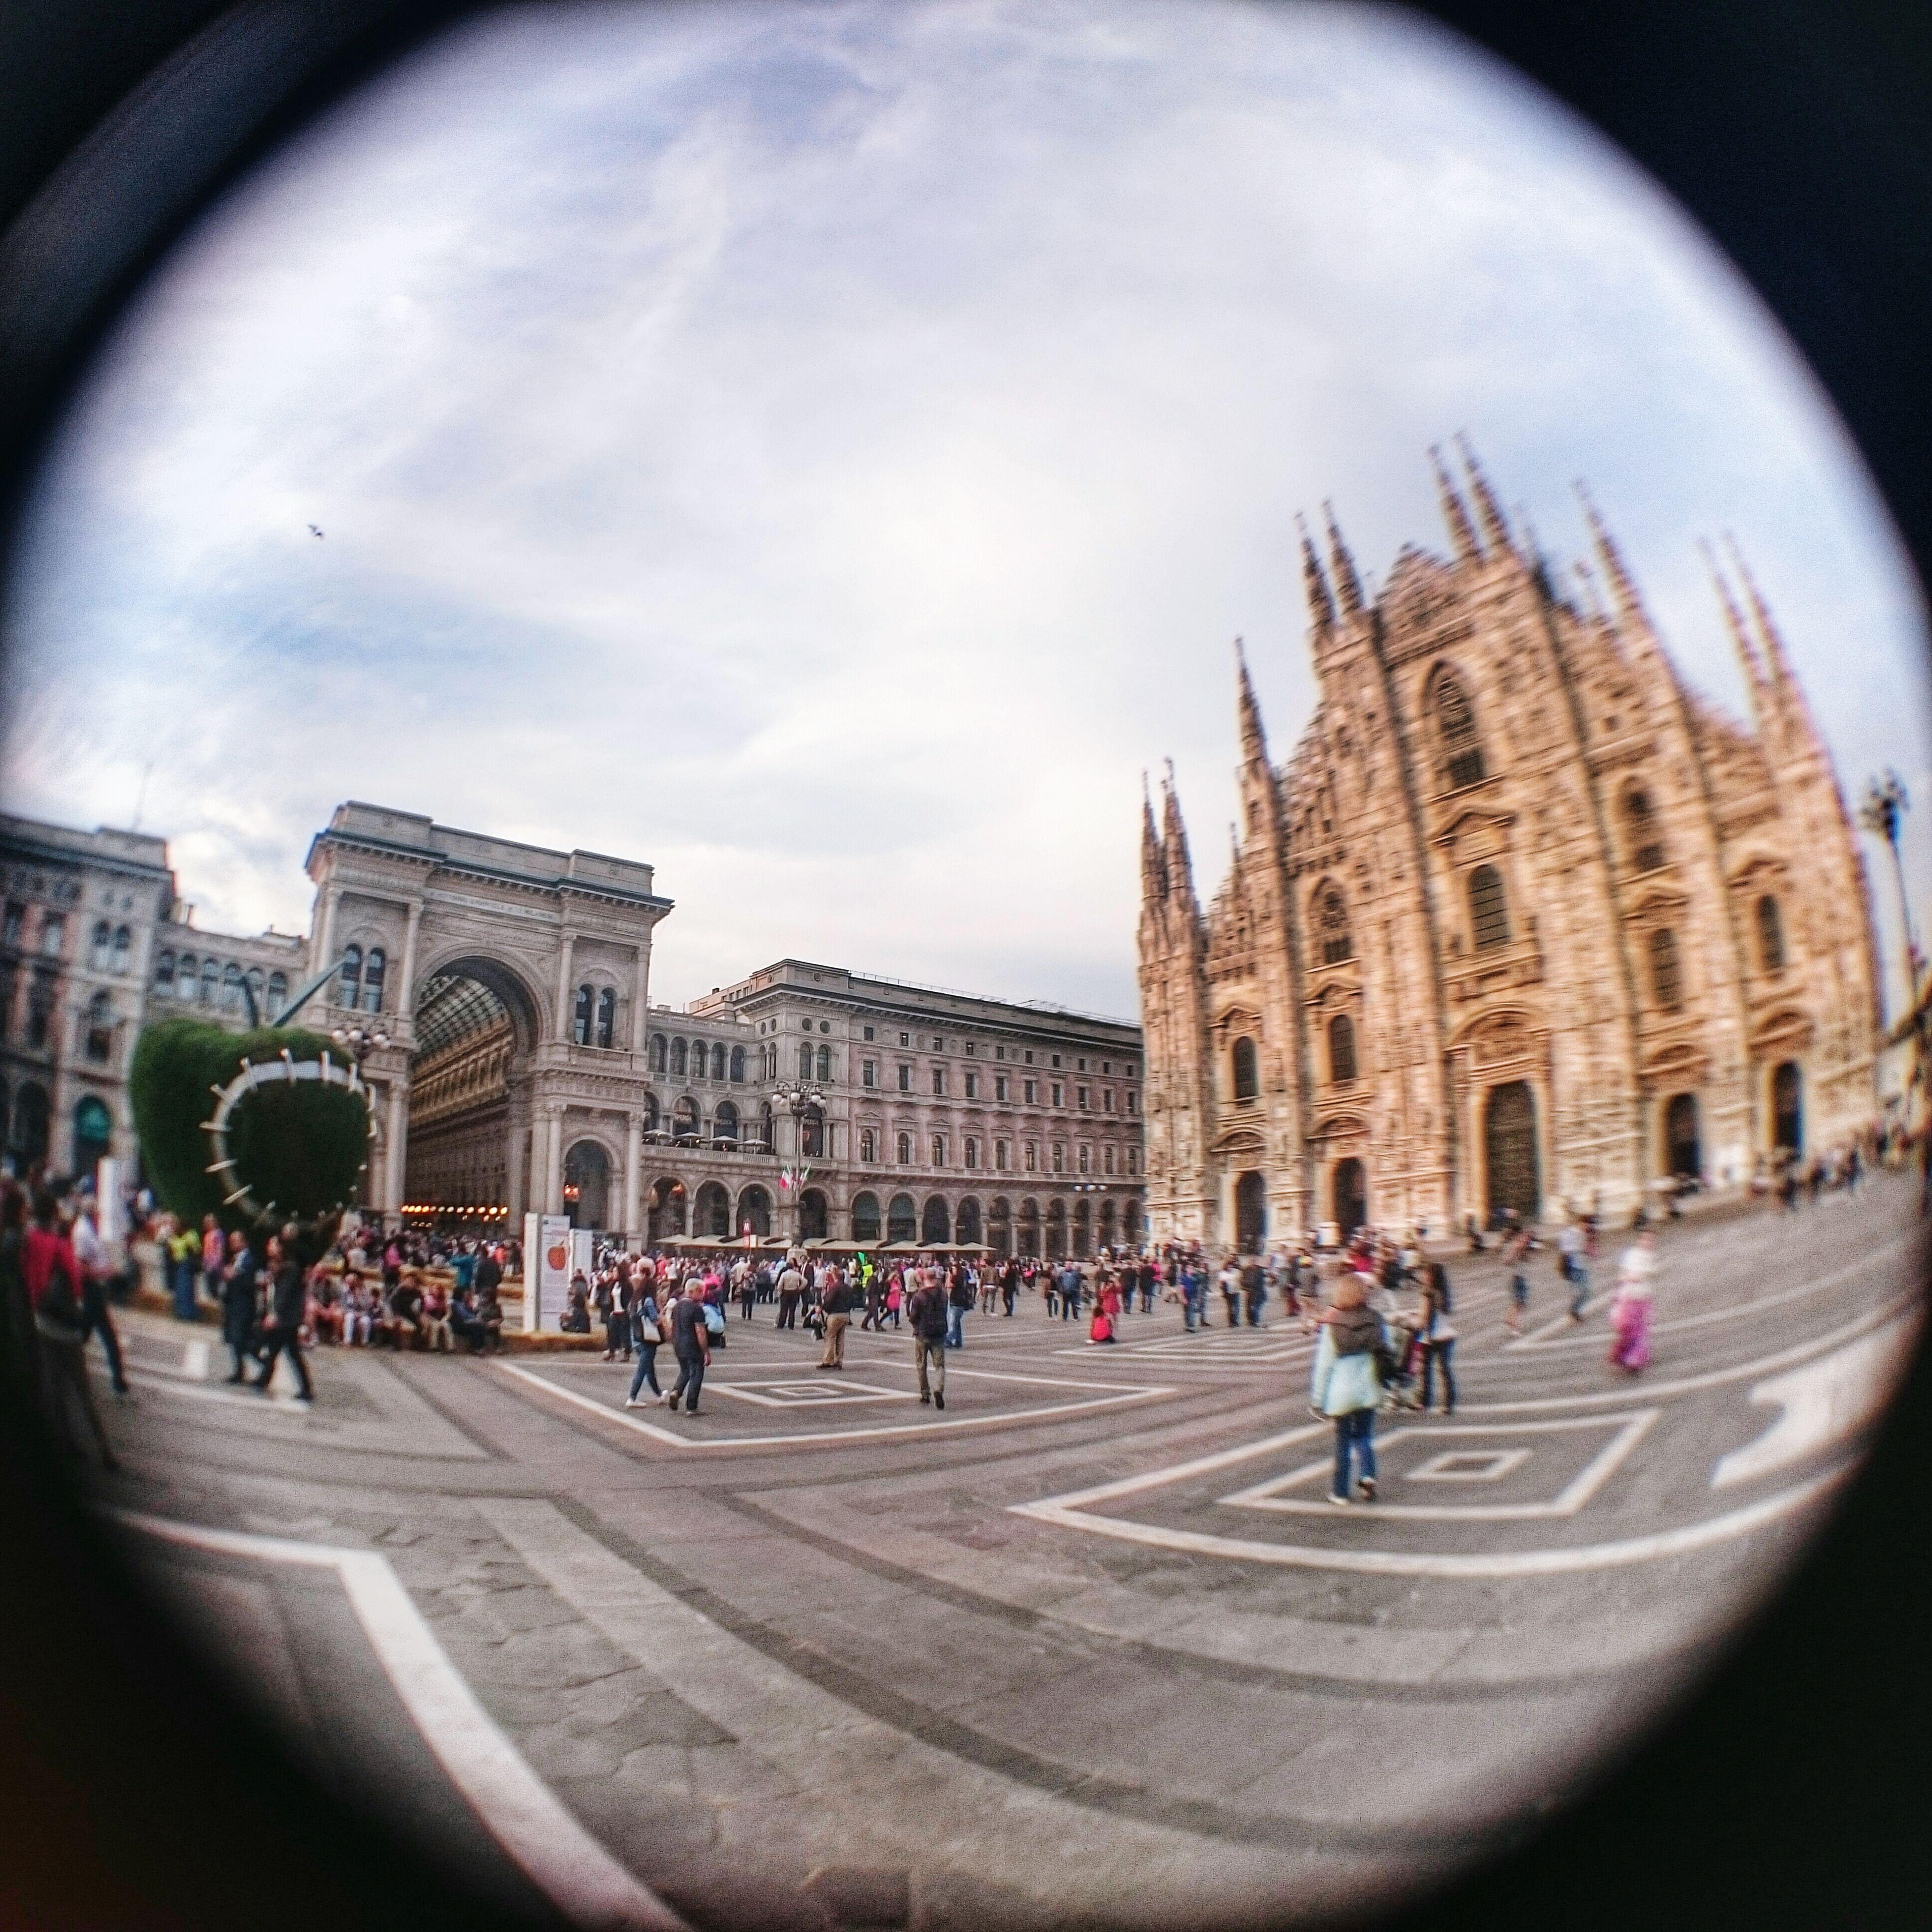 Art Apple Cathedral Duomo Duomo Di Milano Expo Michelangelo Pistoletto Il terzo Paradiso. La mela reintegrata Fisheye Sony XperiaZ3